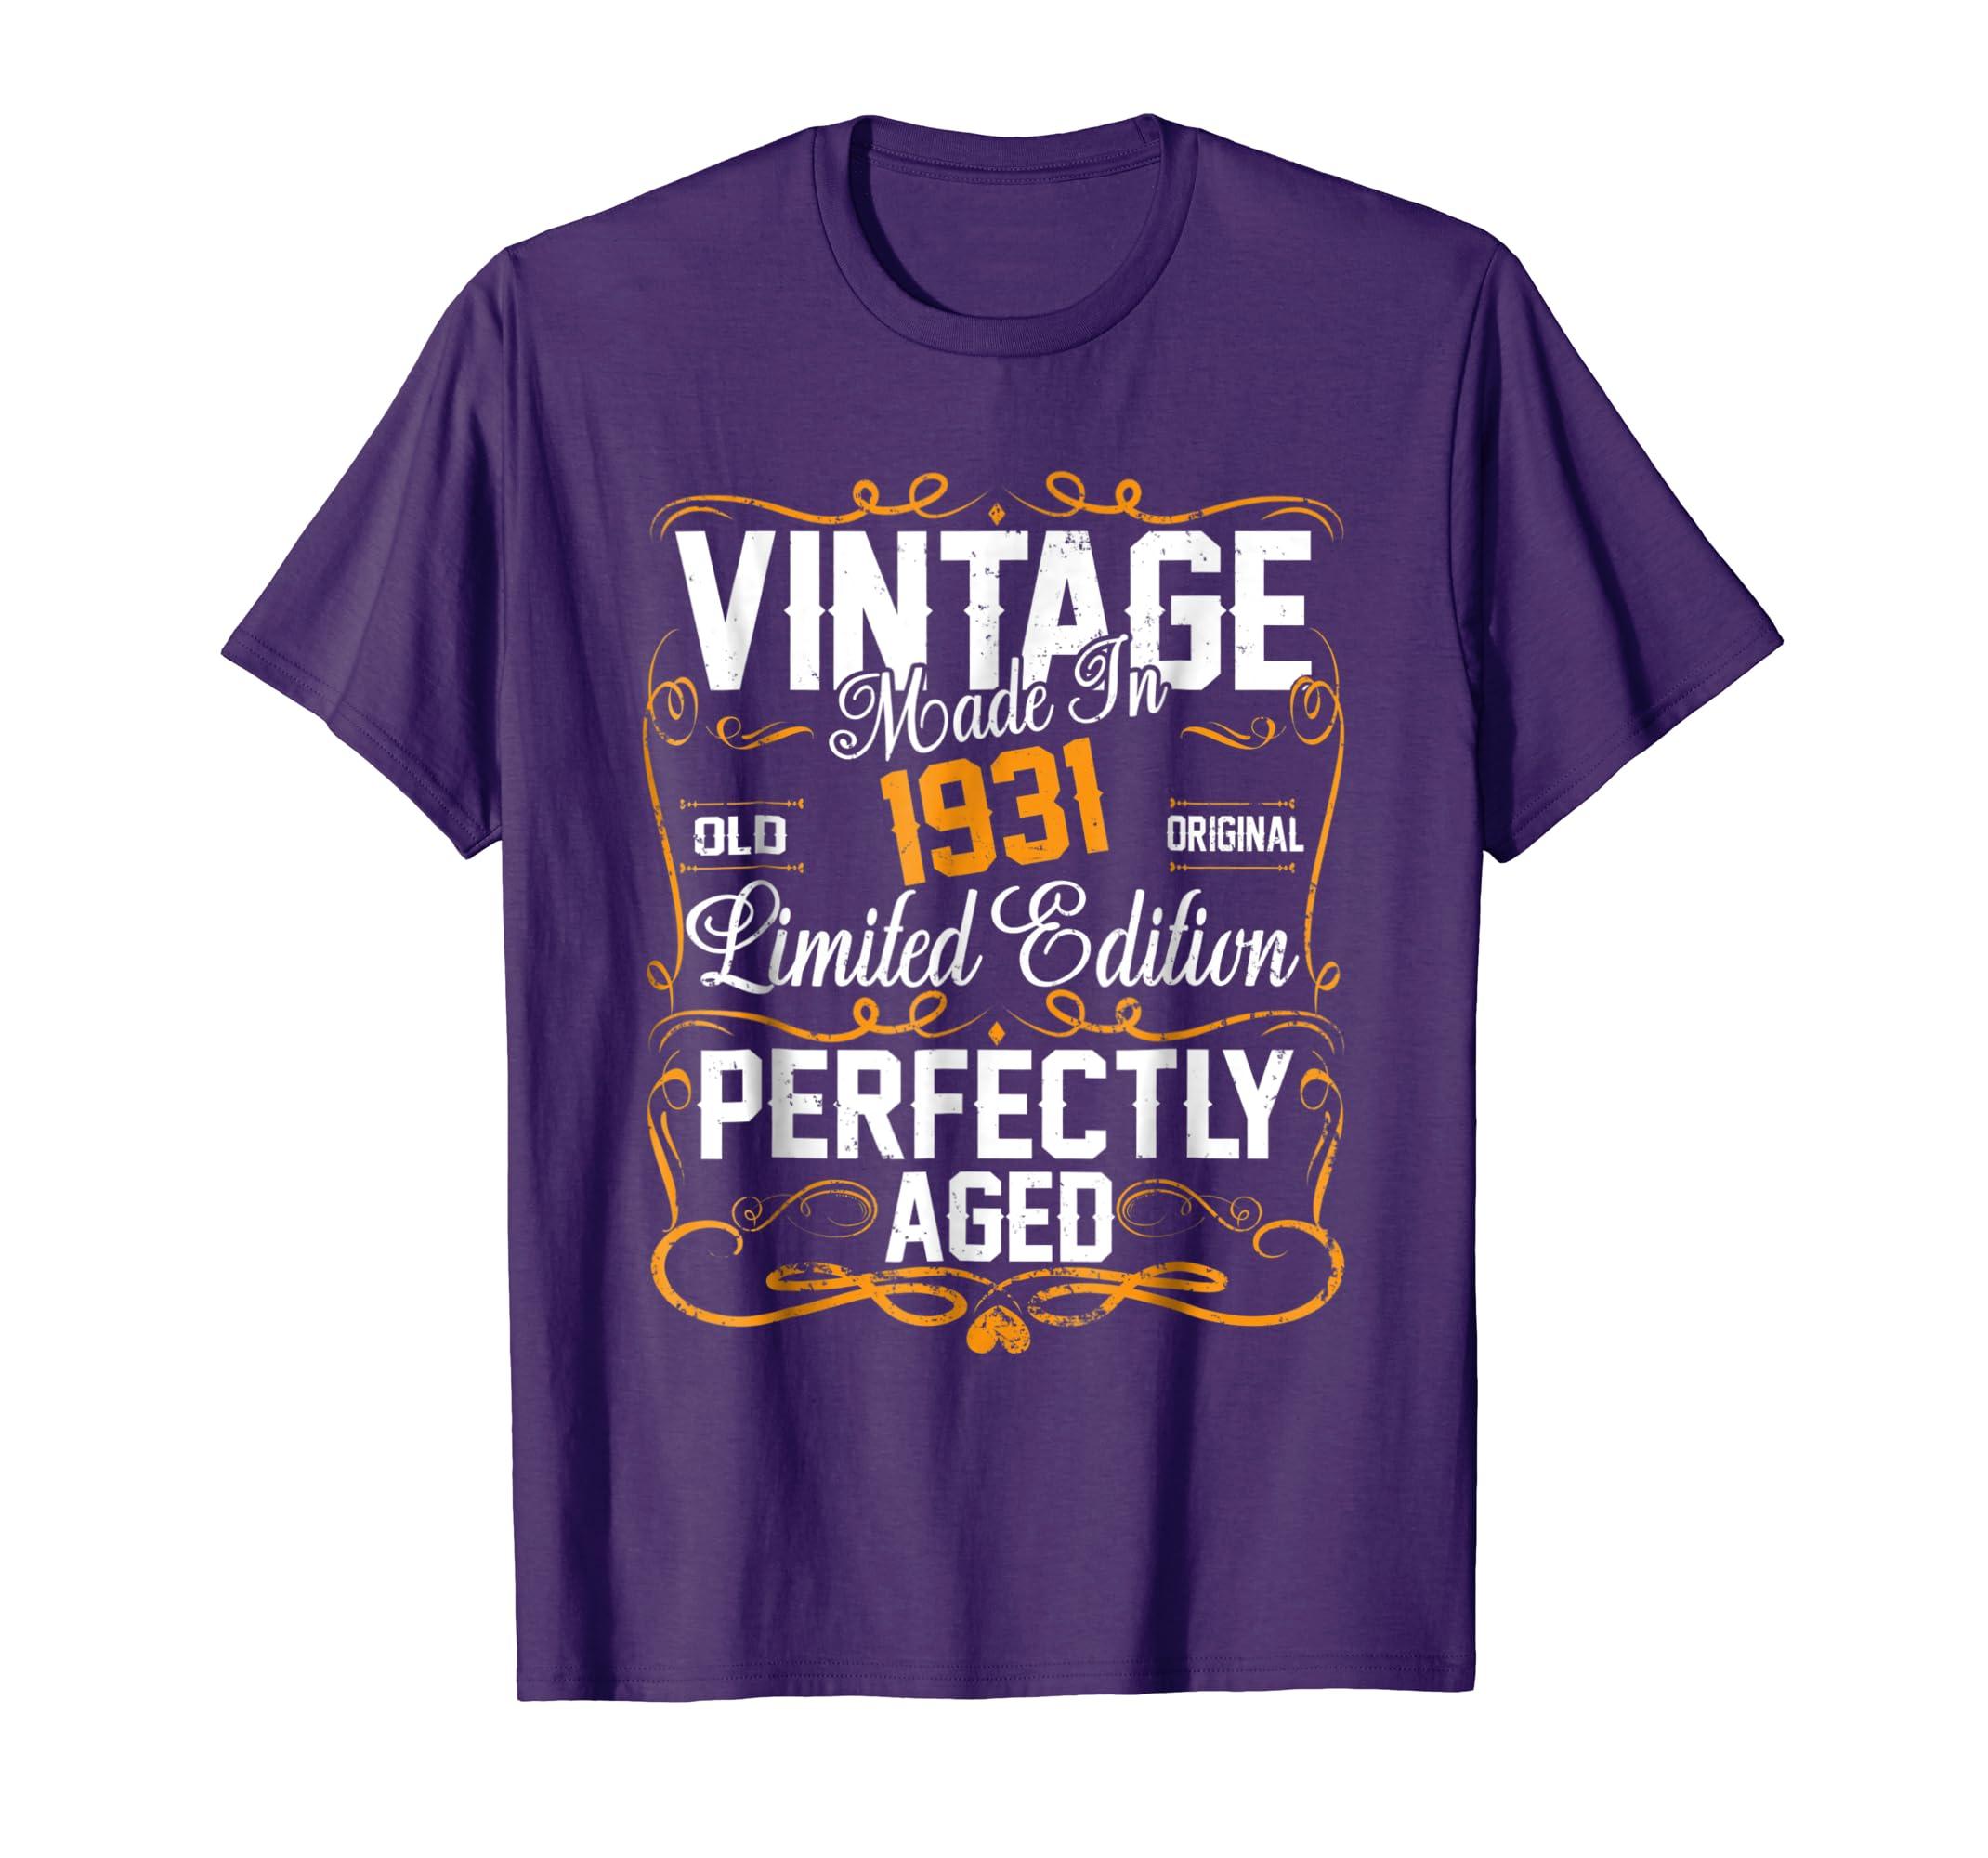 Amazon 87th Birthday Gift Shirt Vintage Dude 1931 87 Year Old Clothing